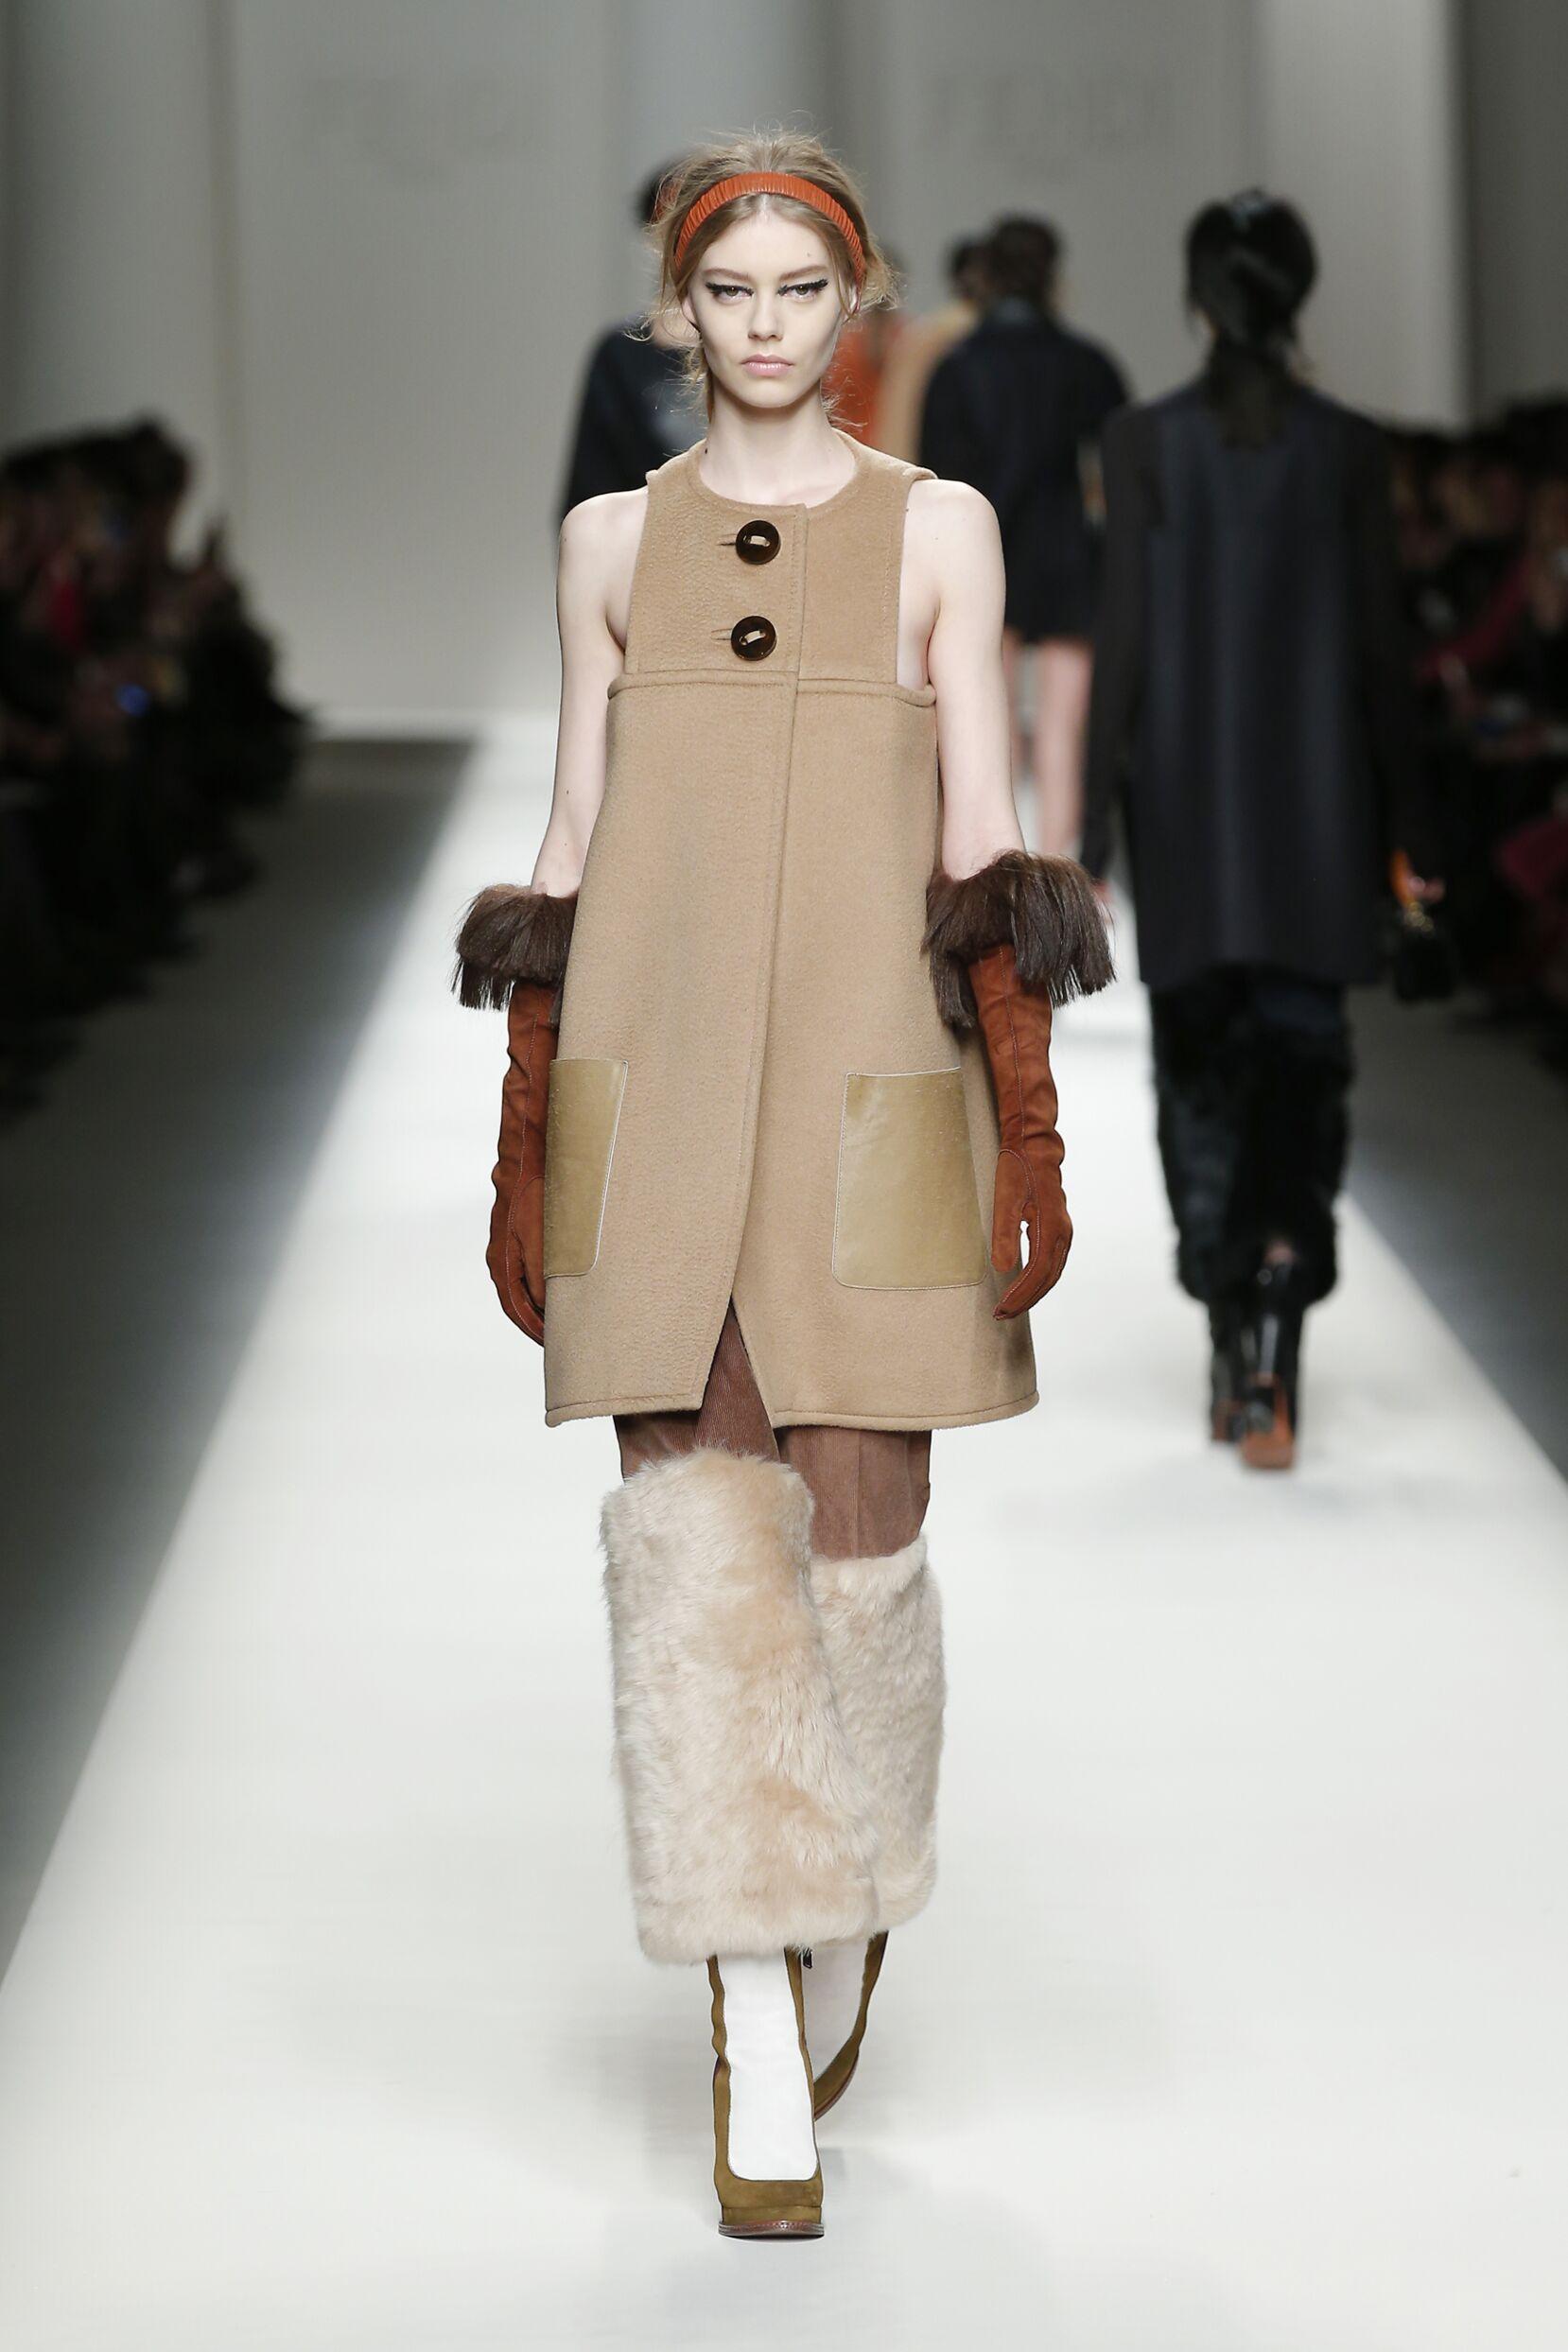 Catwalk Fendi Collection Fashion Show Winter 2015